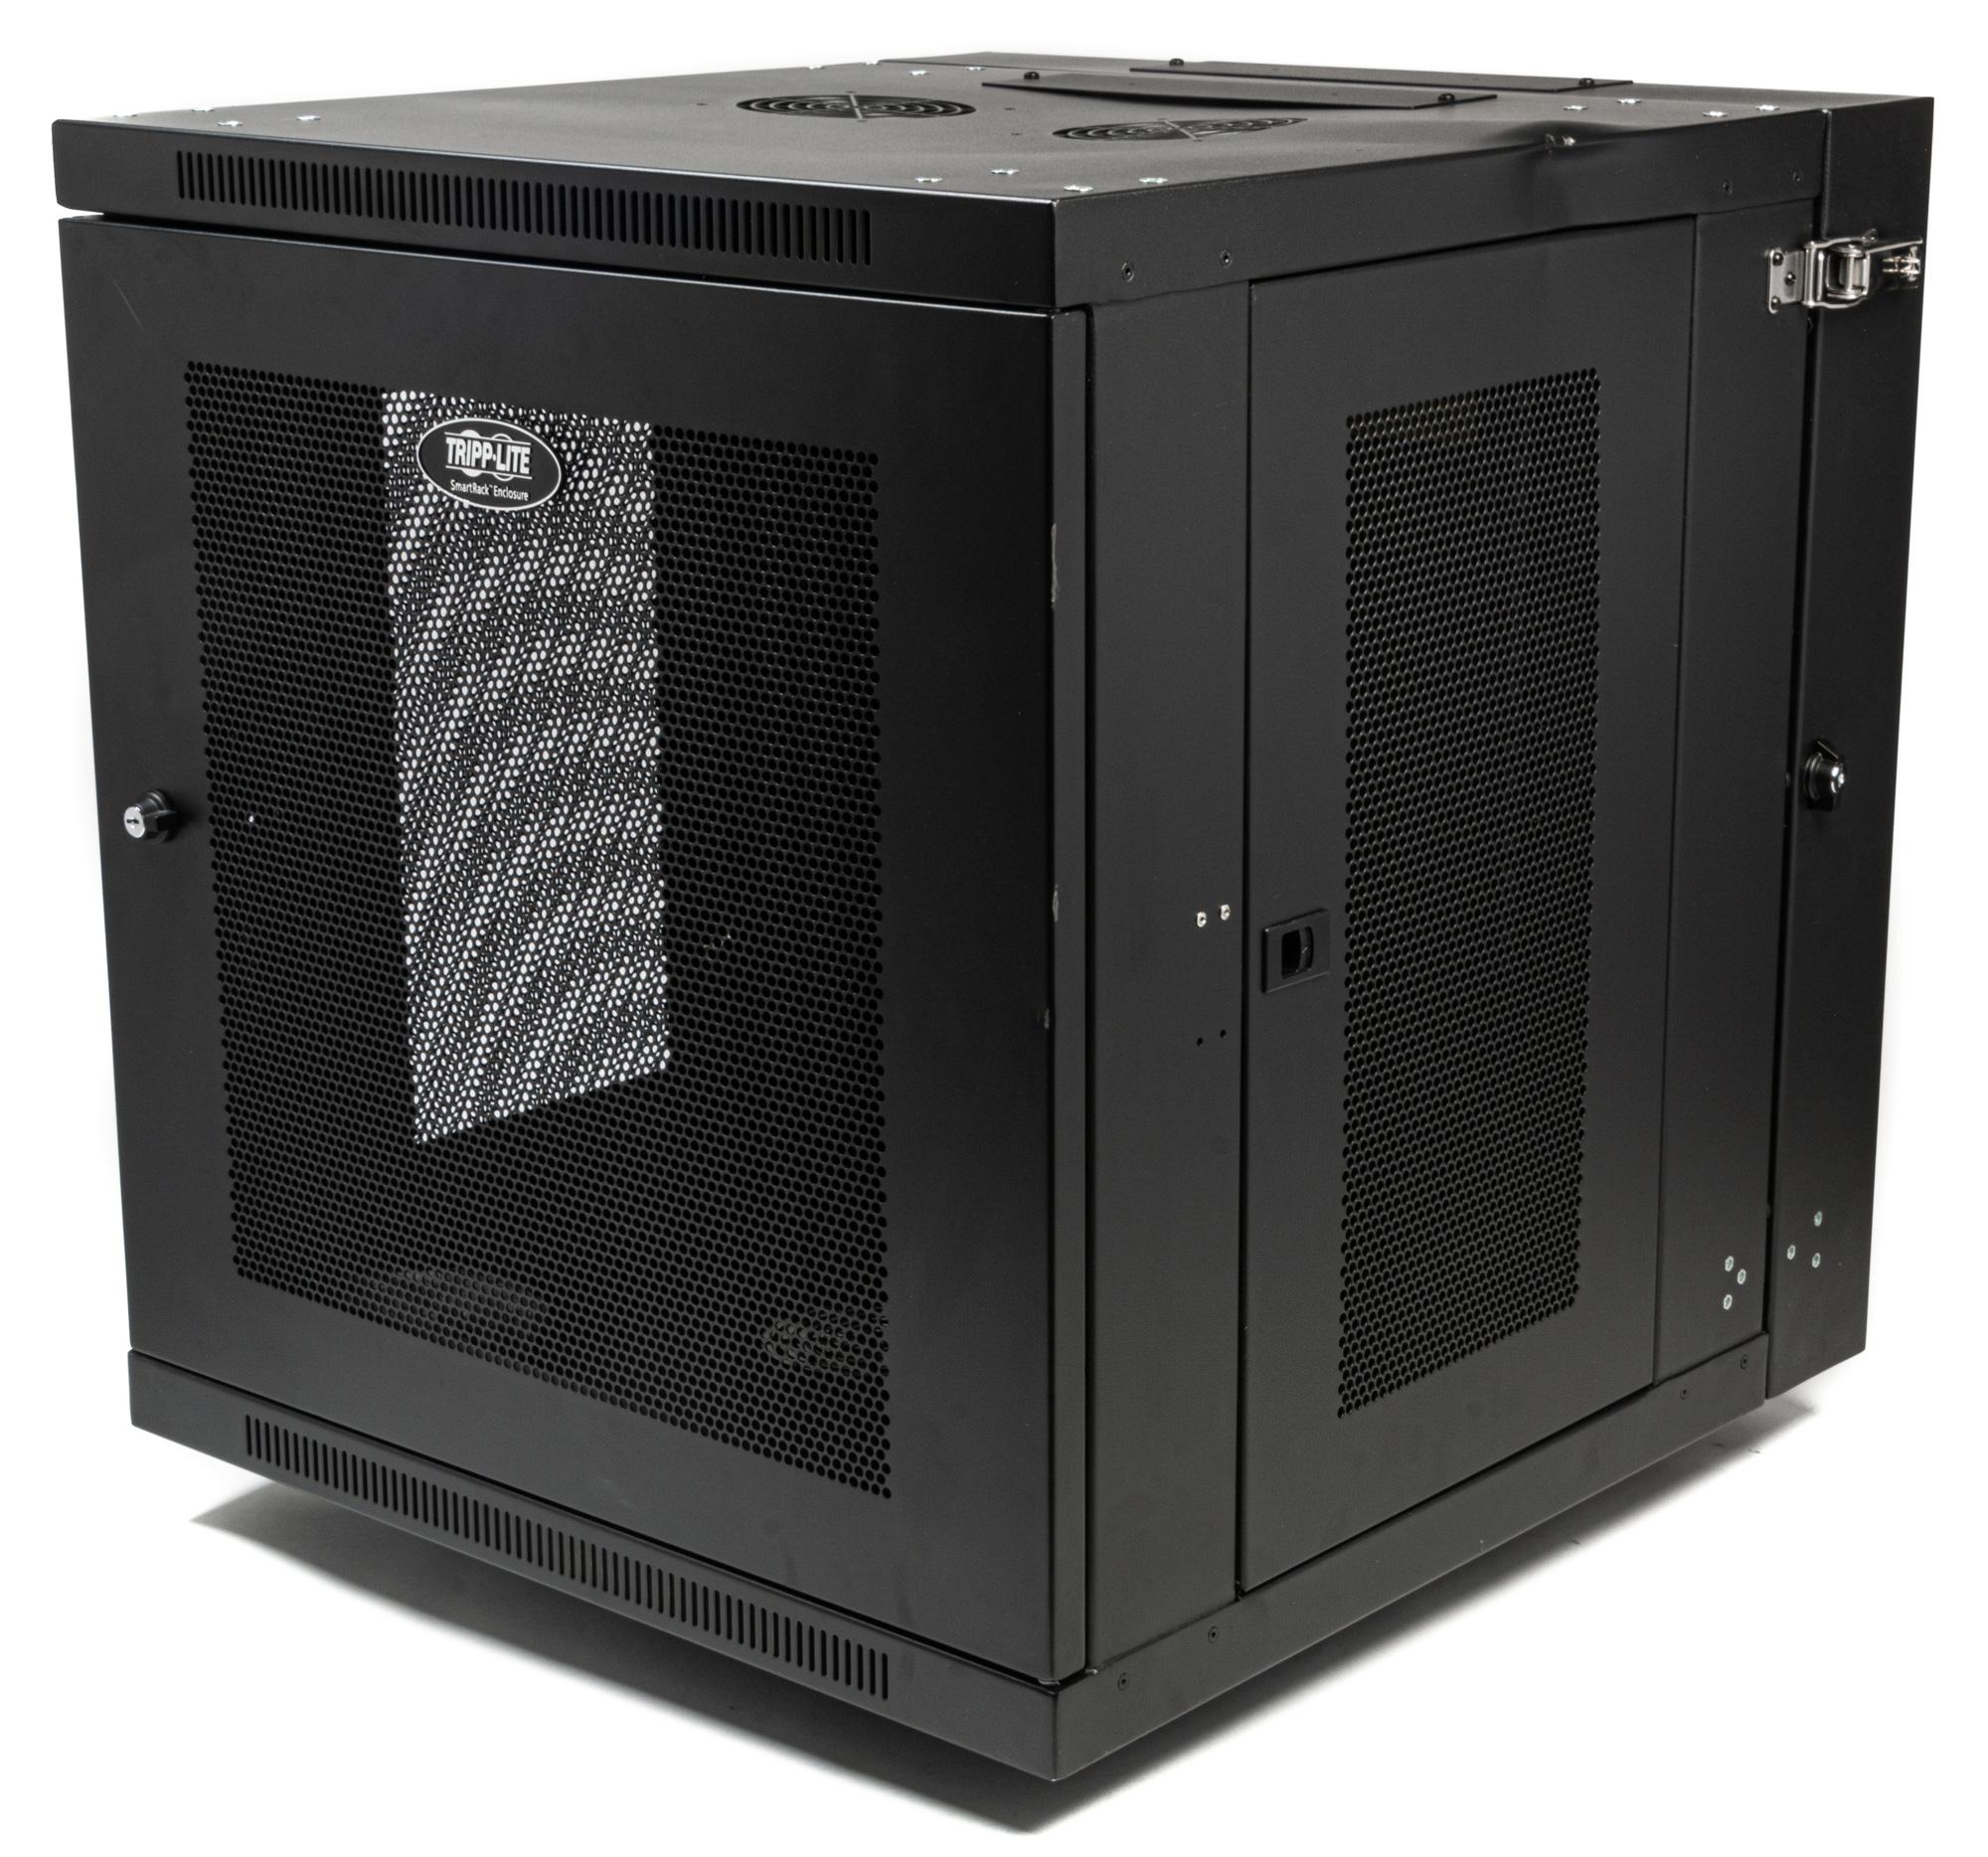 https www markertek com product trl srw12usdp bs tripp lite 12u wall mount rack enclosure cabinet double hinge removable side panels bstock dent on top corner of unit